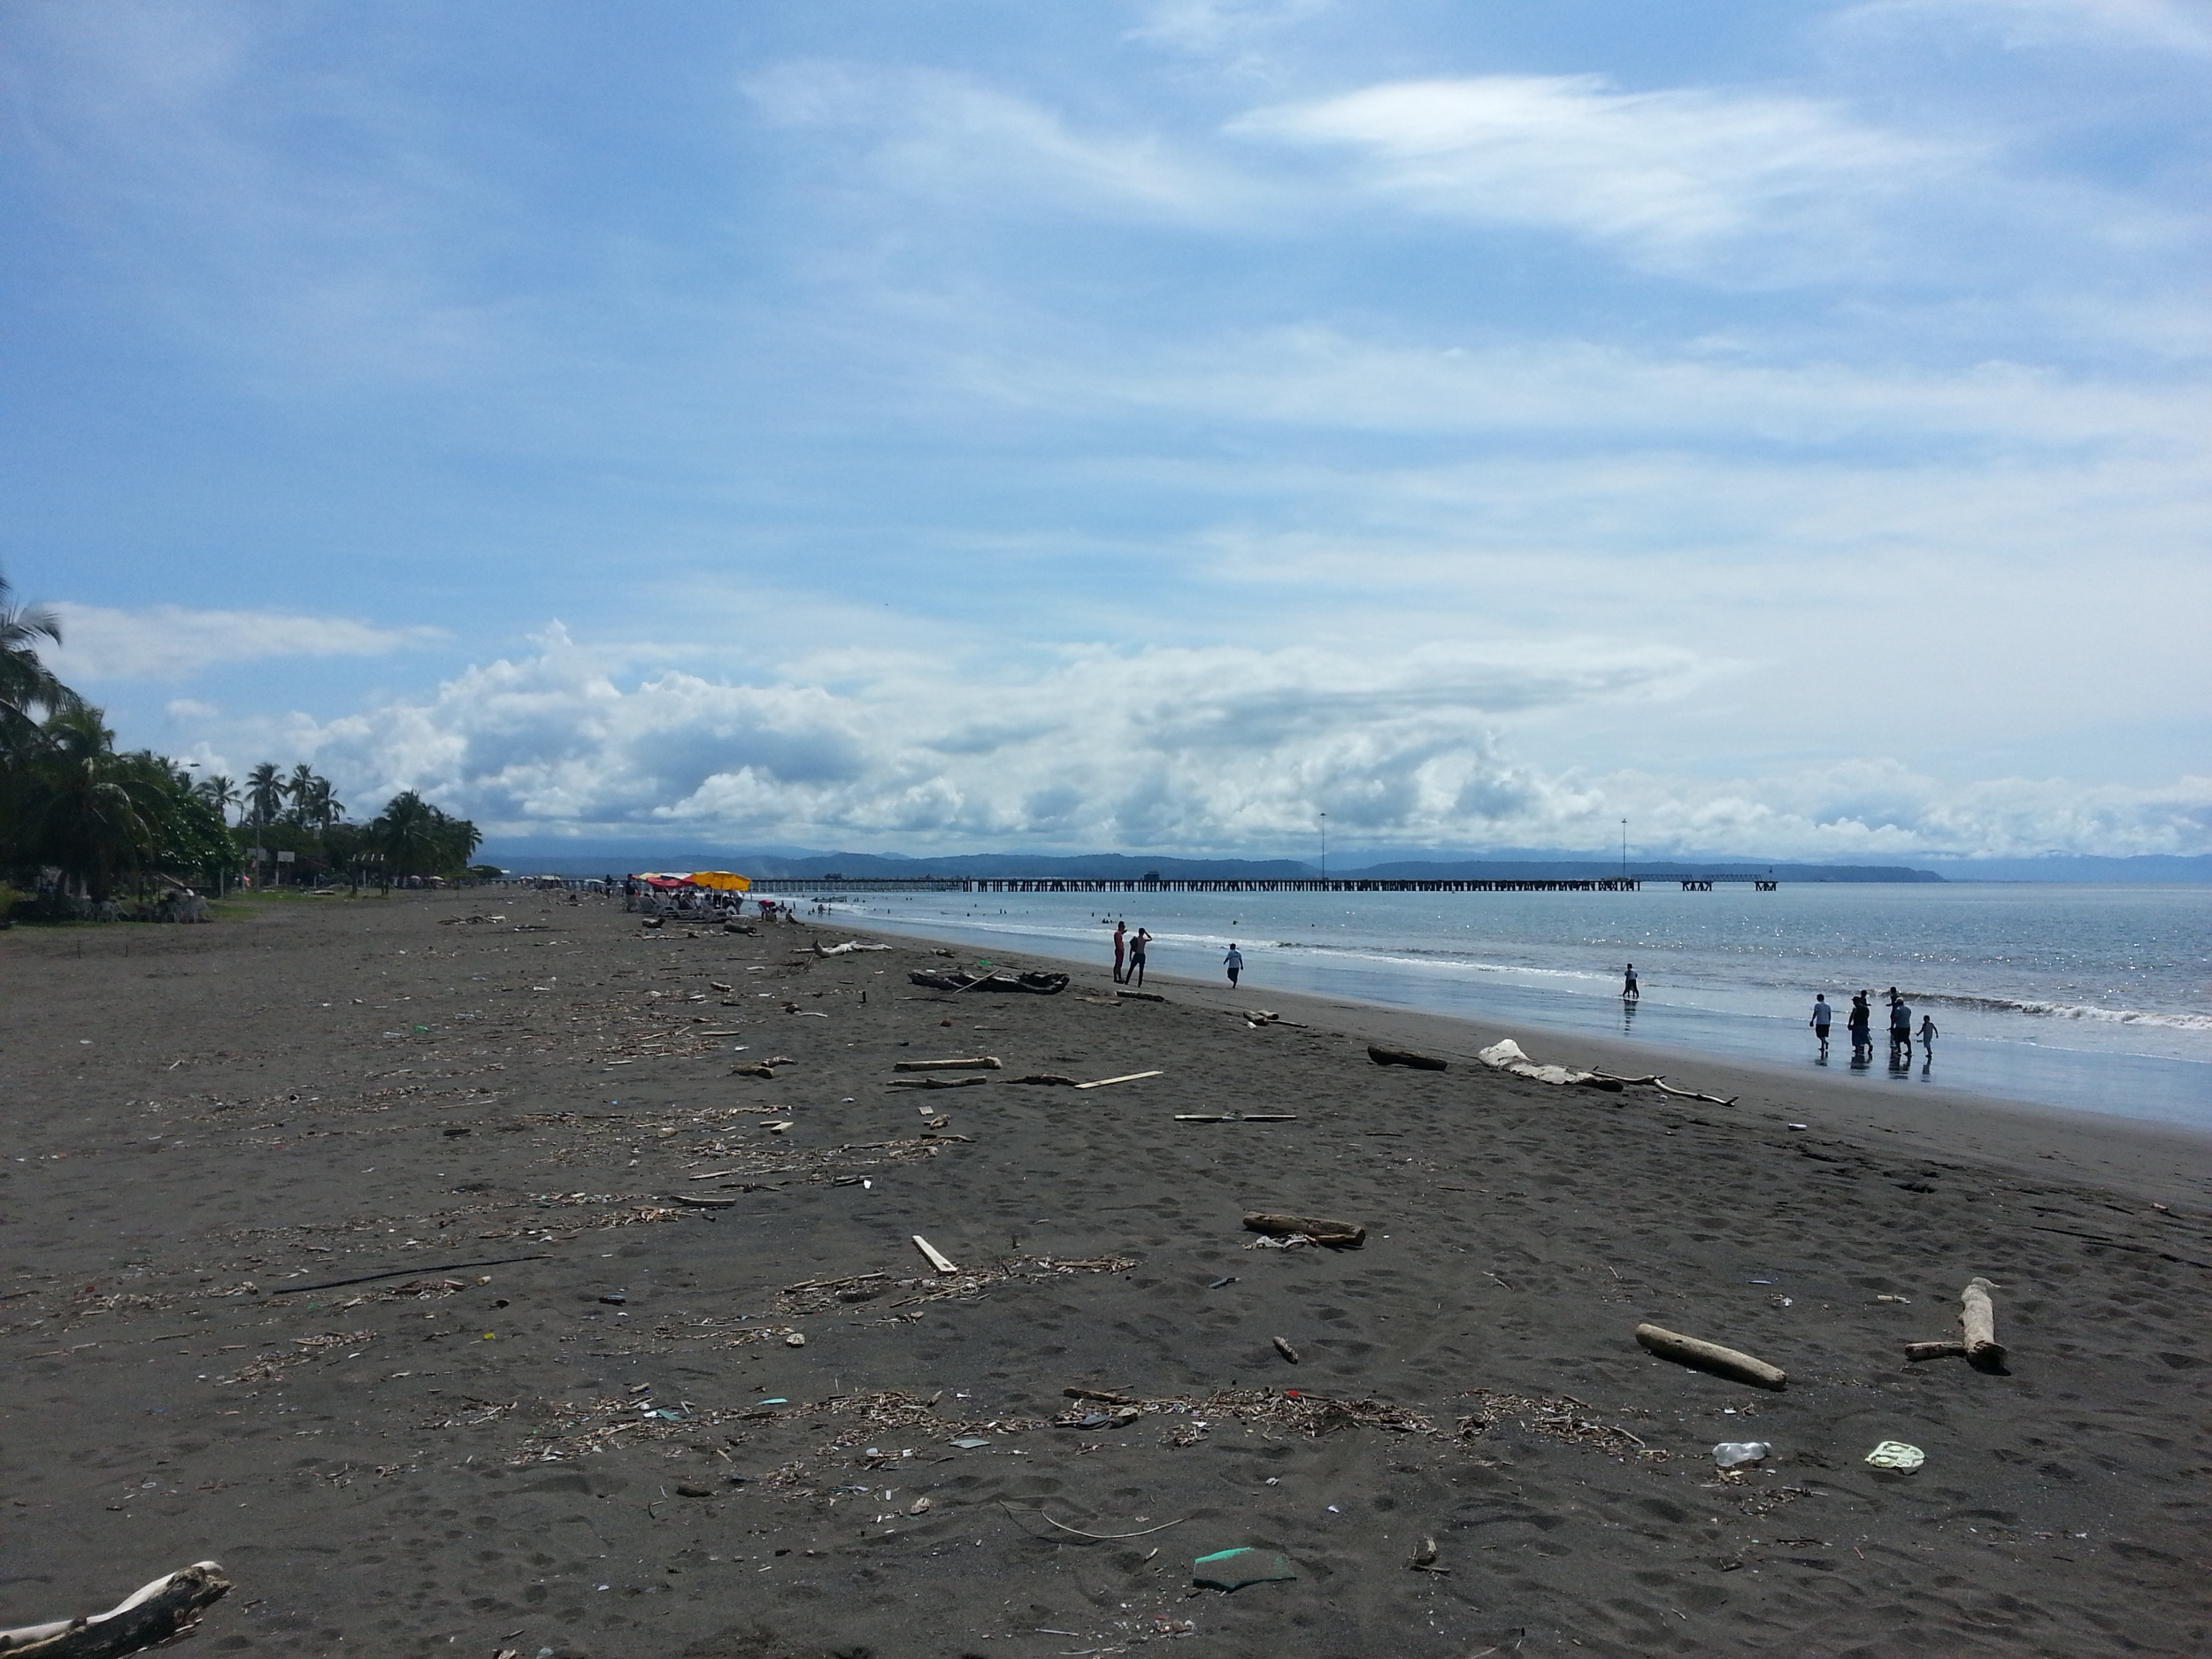 Puntareana beach...a nice clean beach it is not.